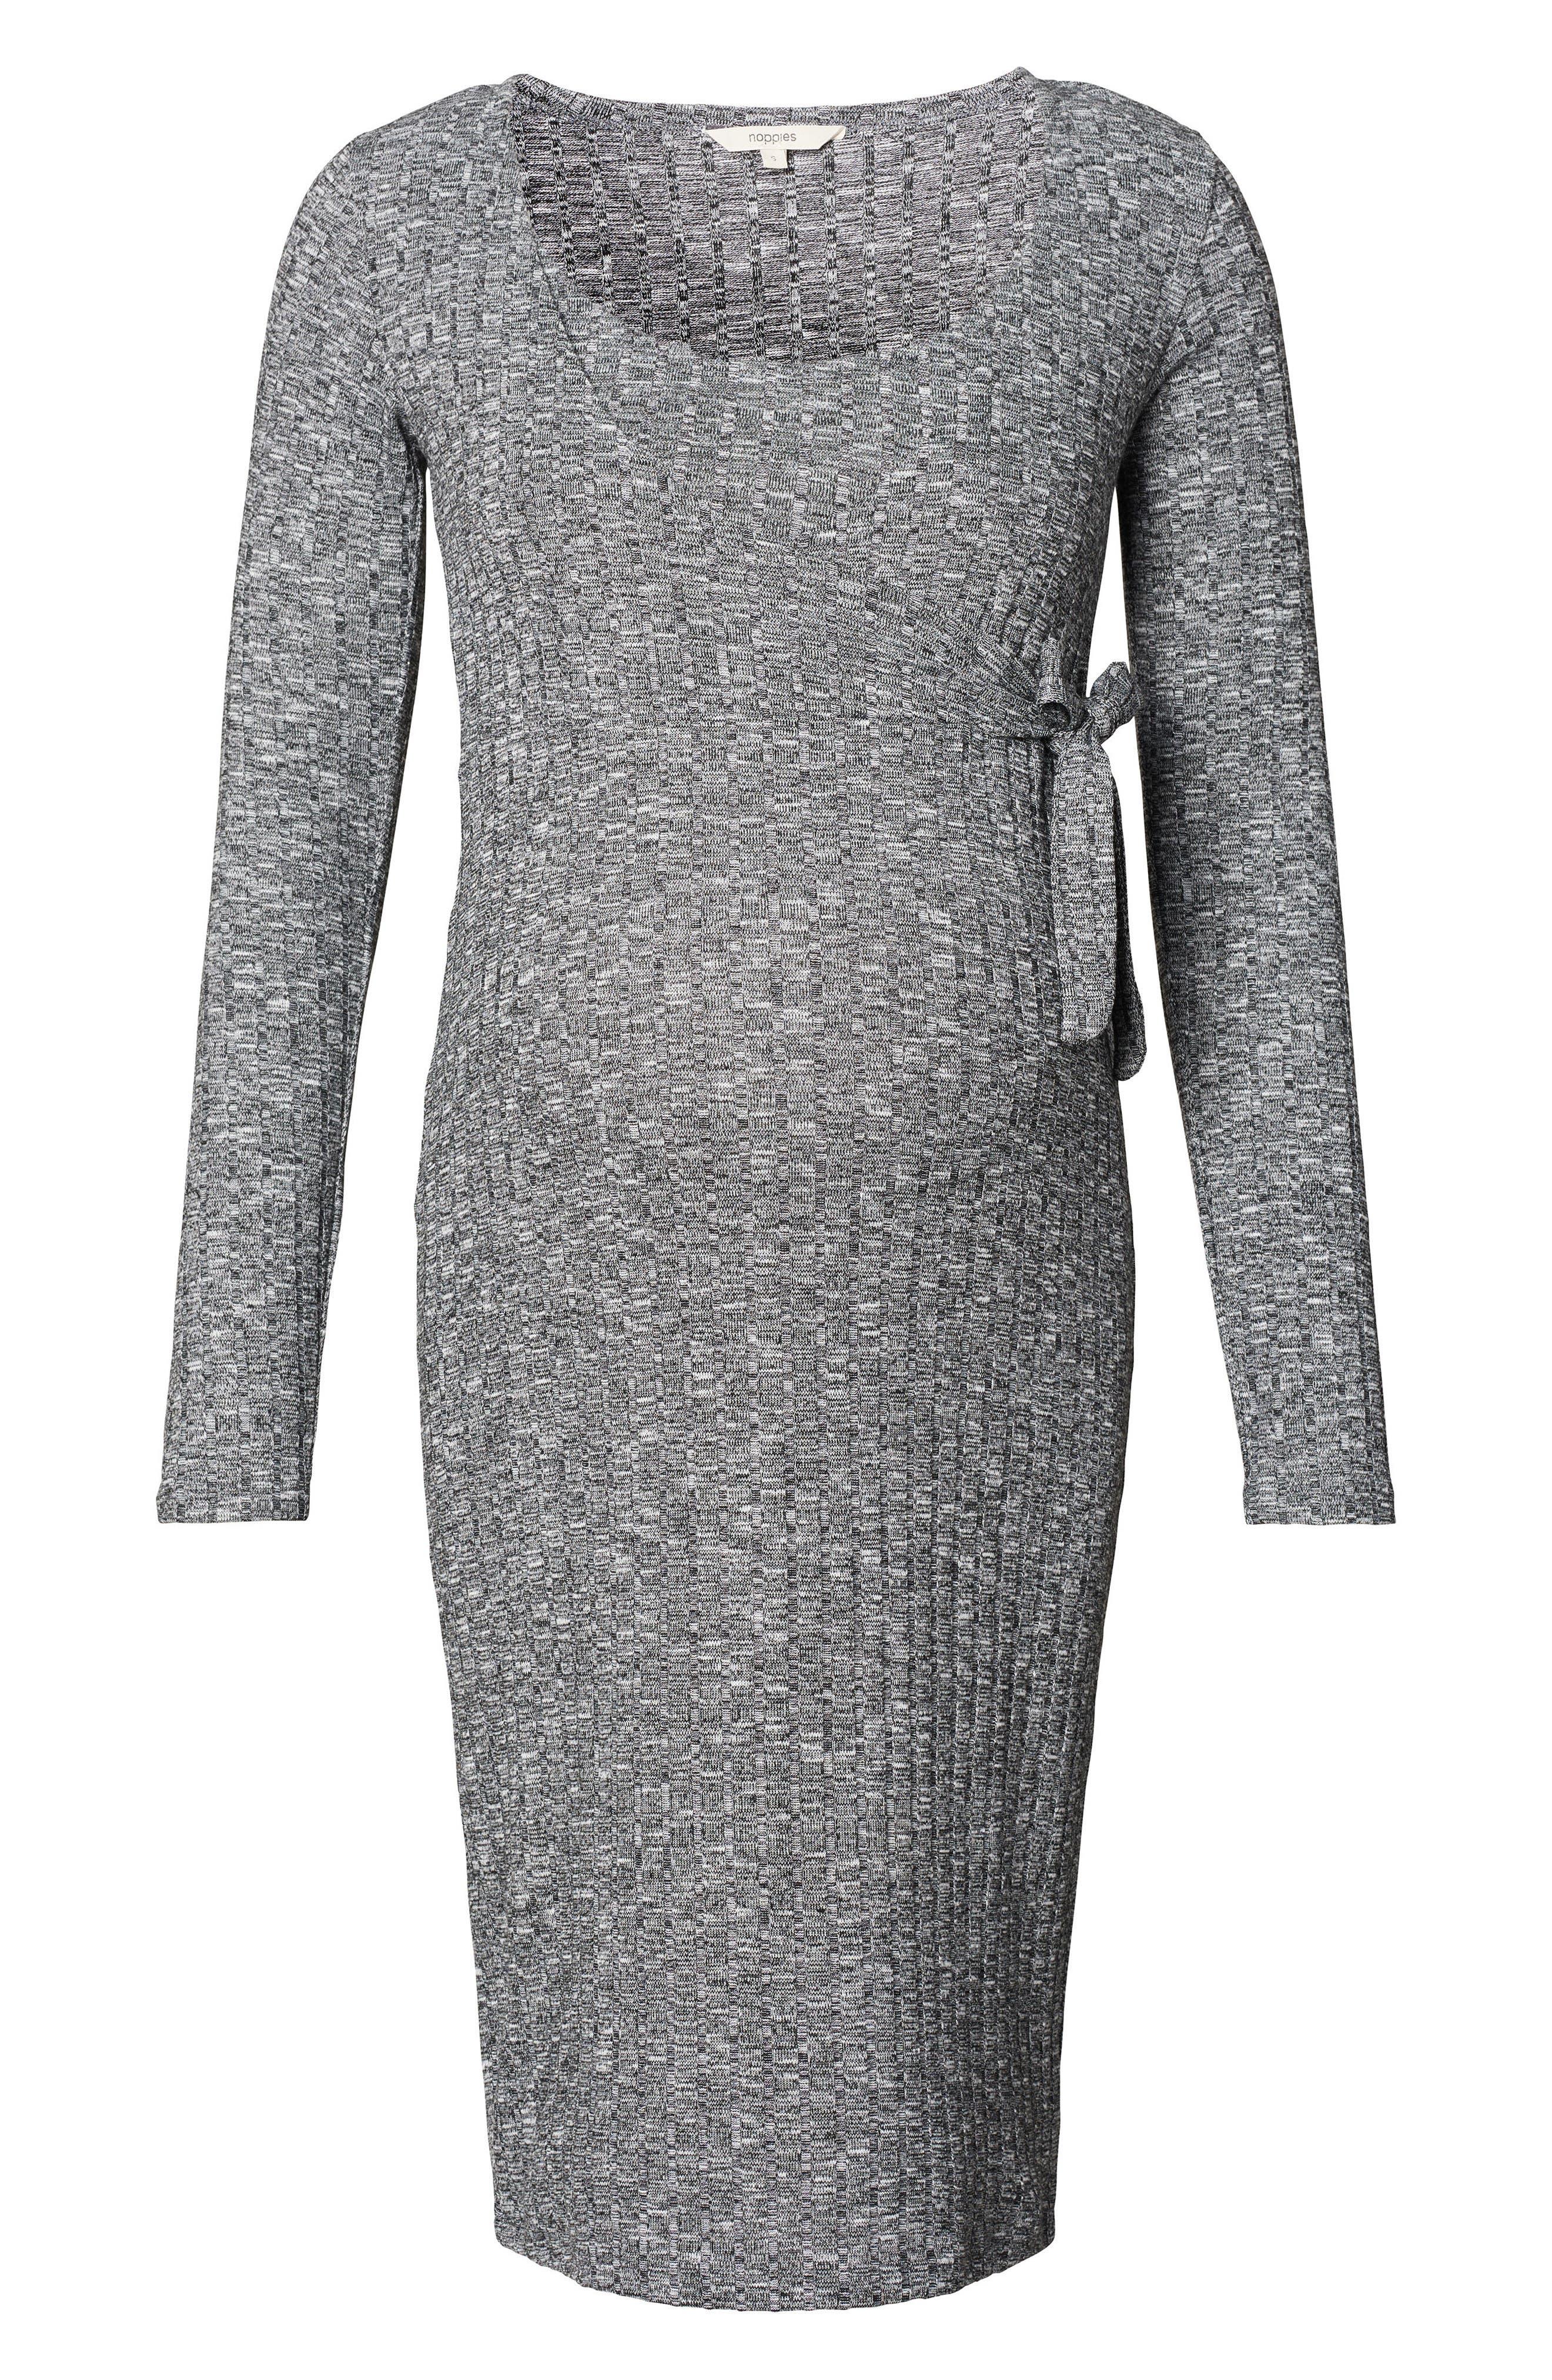 Giulia Maternity Sweater Dress,                             Main thumbnail 1, color,                             Anthracite Melange